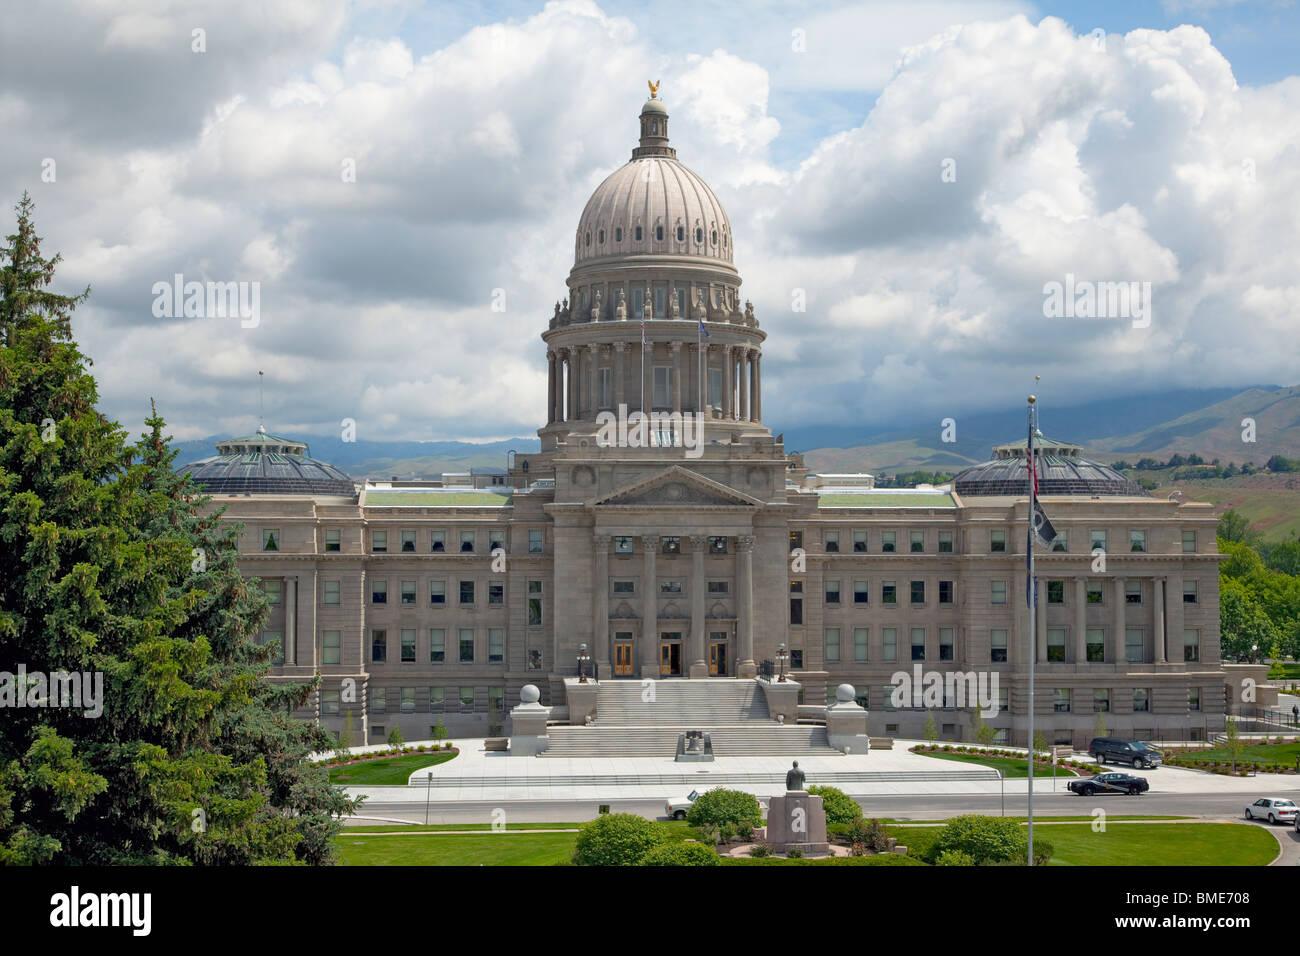 The Capitol Building, Boise, Idaho, US Stock Photo